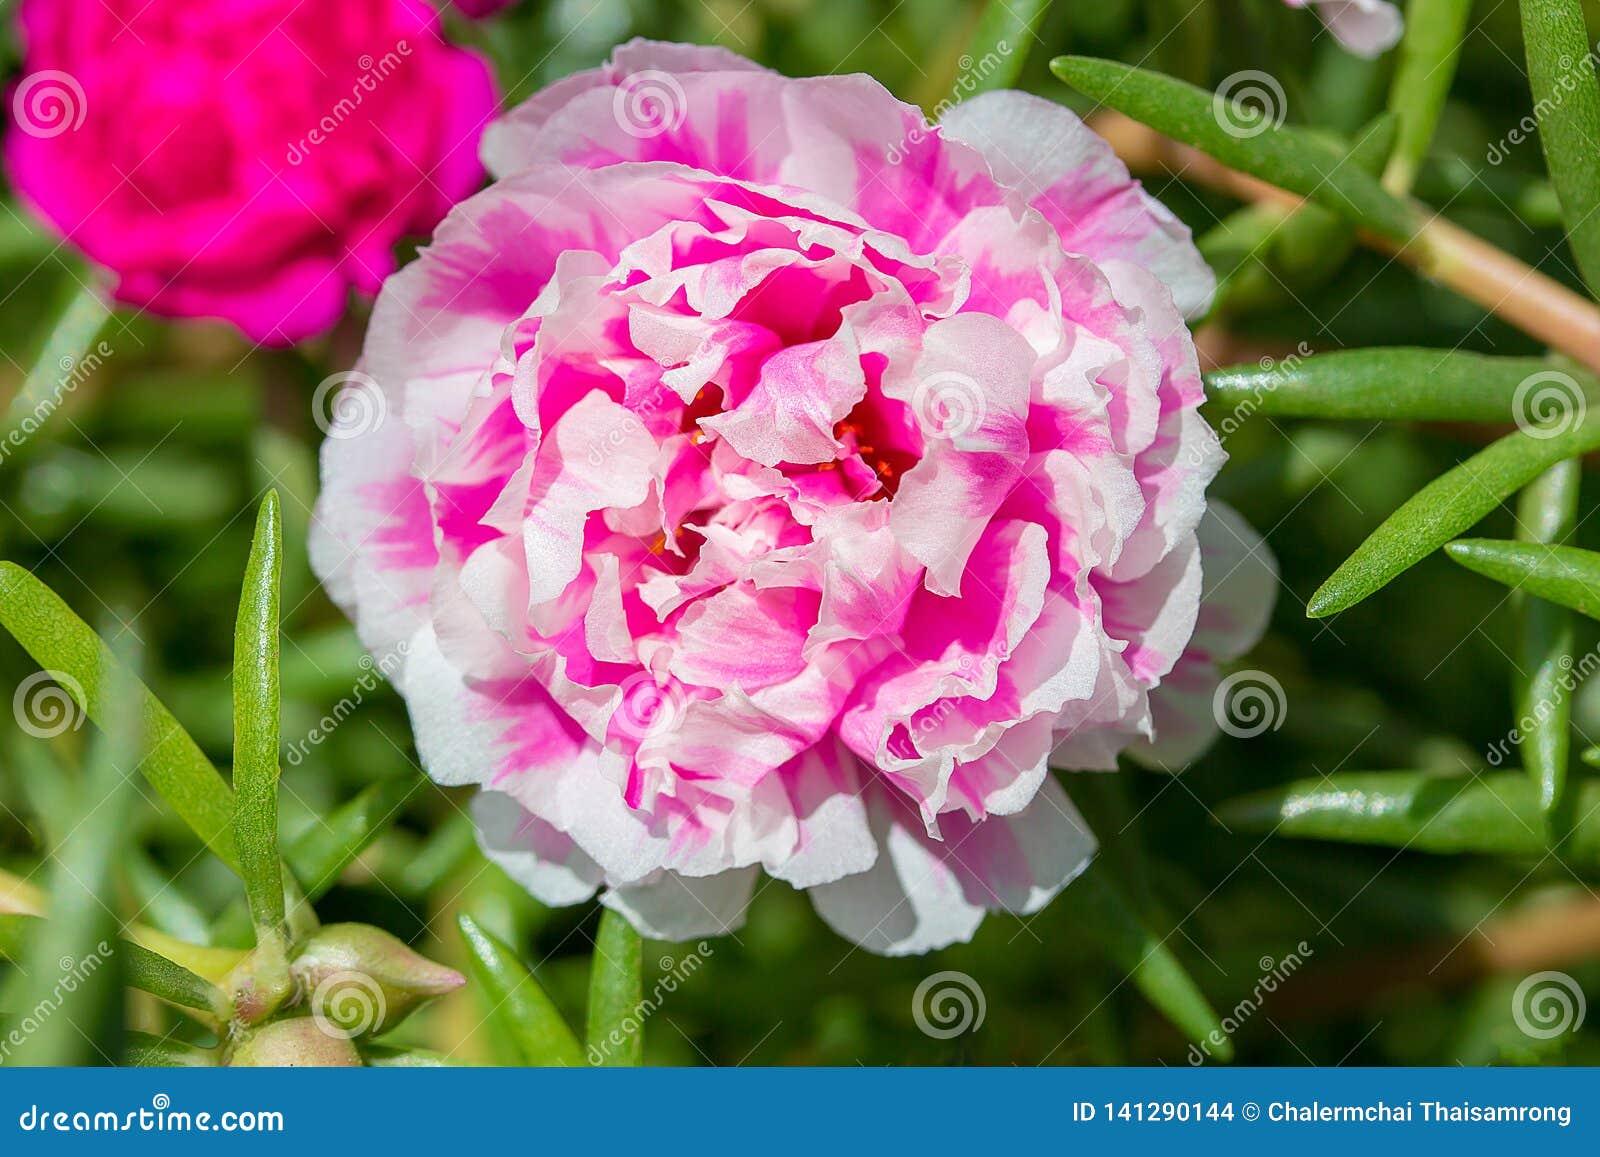 Portulaca flower in garden. Closeup pink